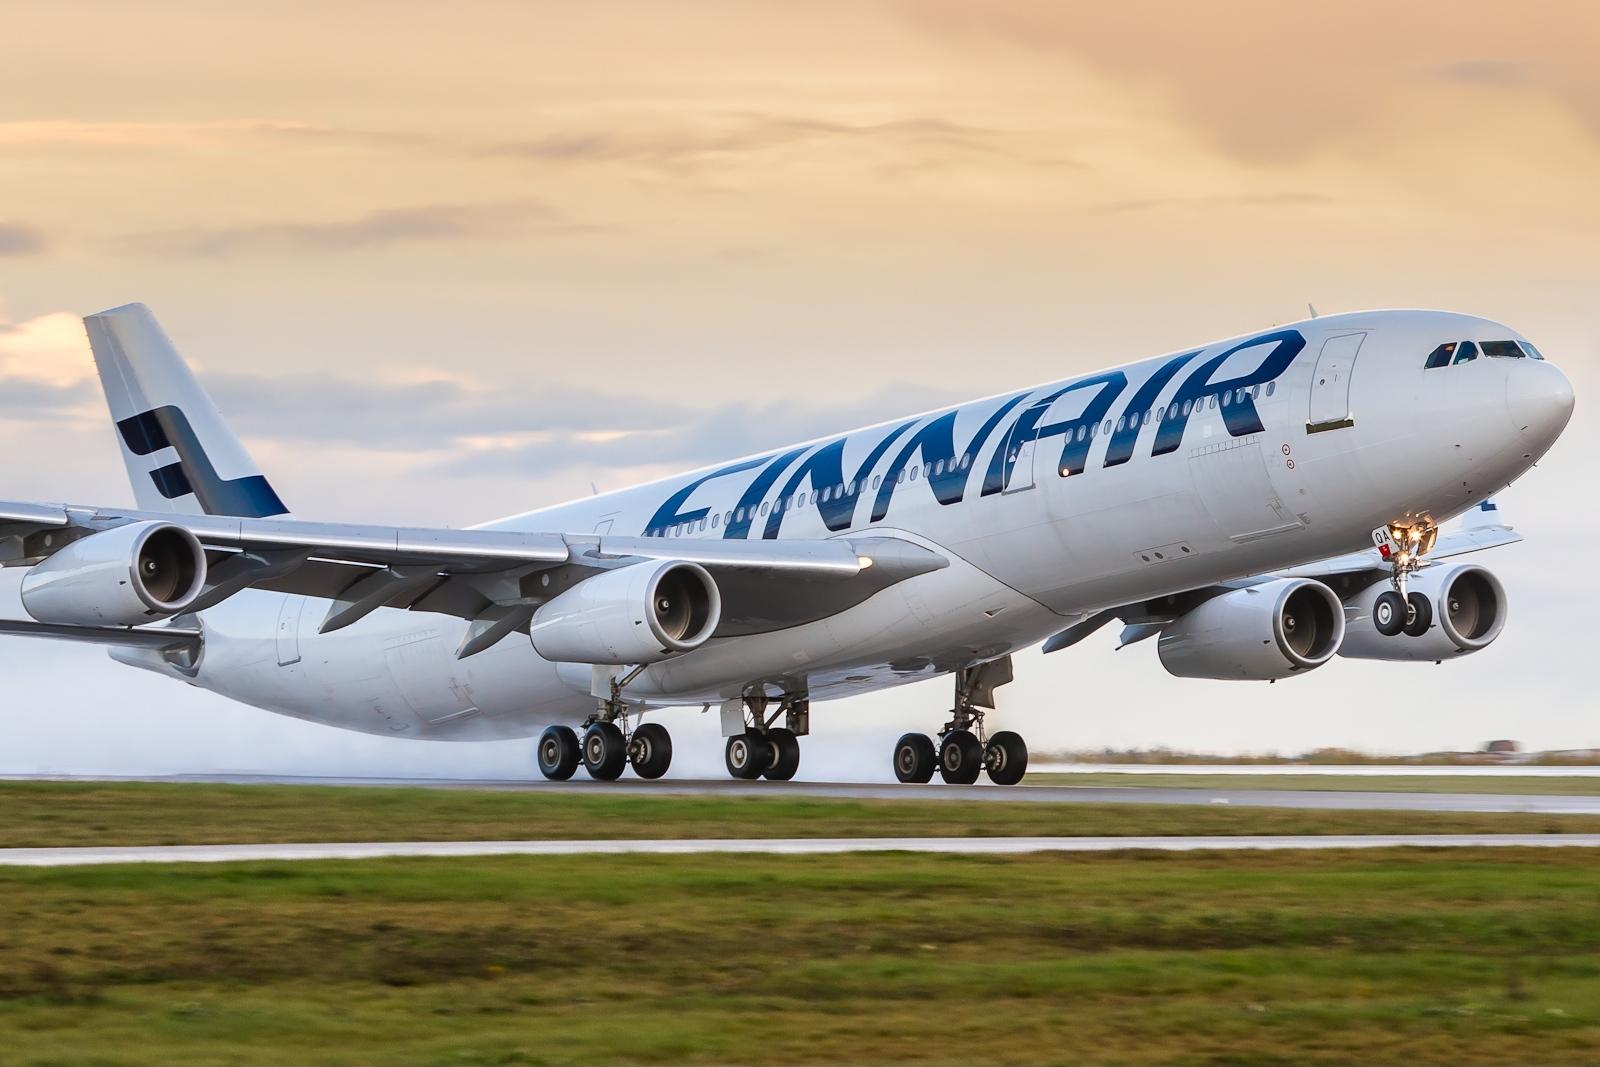 Finnair adds cargo capacity on the Helsinki-London route